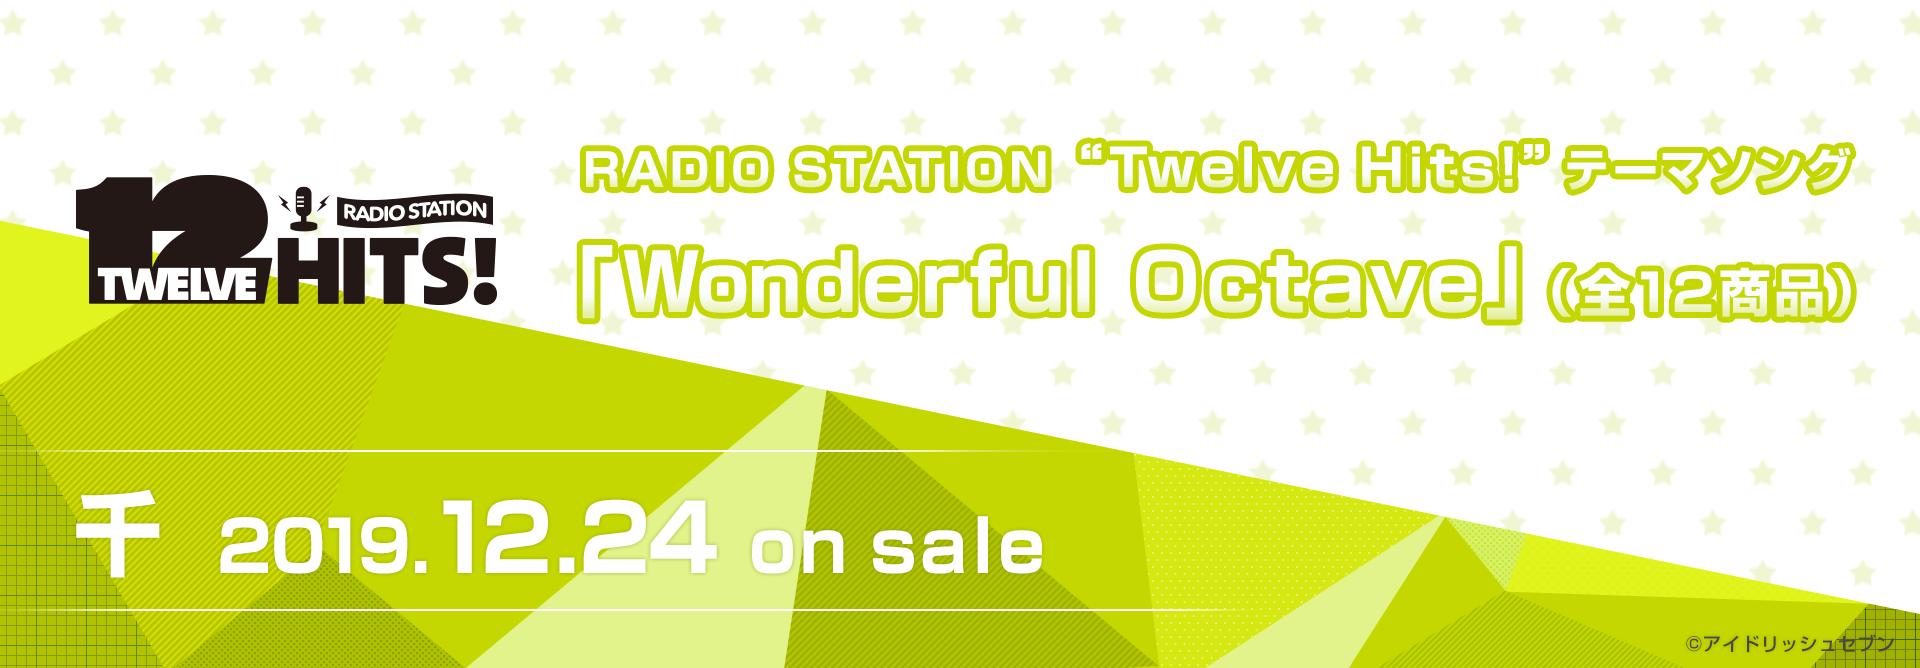 "RADIO STATION ""Twelve Hits!""テーマソング「Wonderful Octave」全12商品"